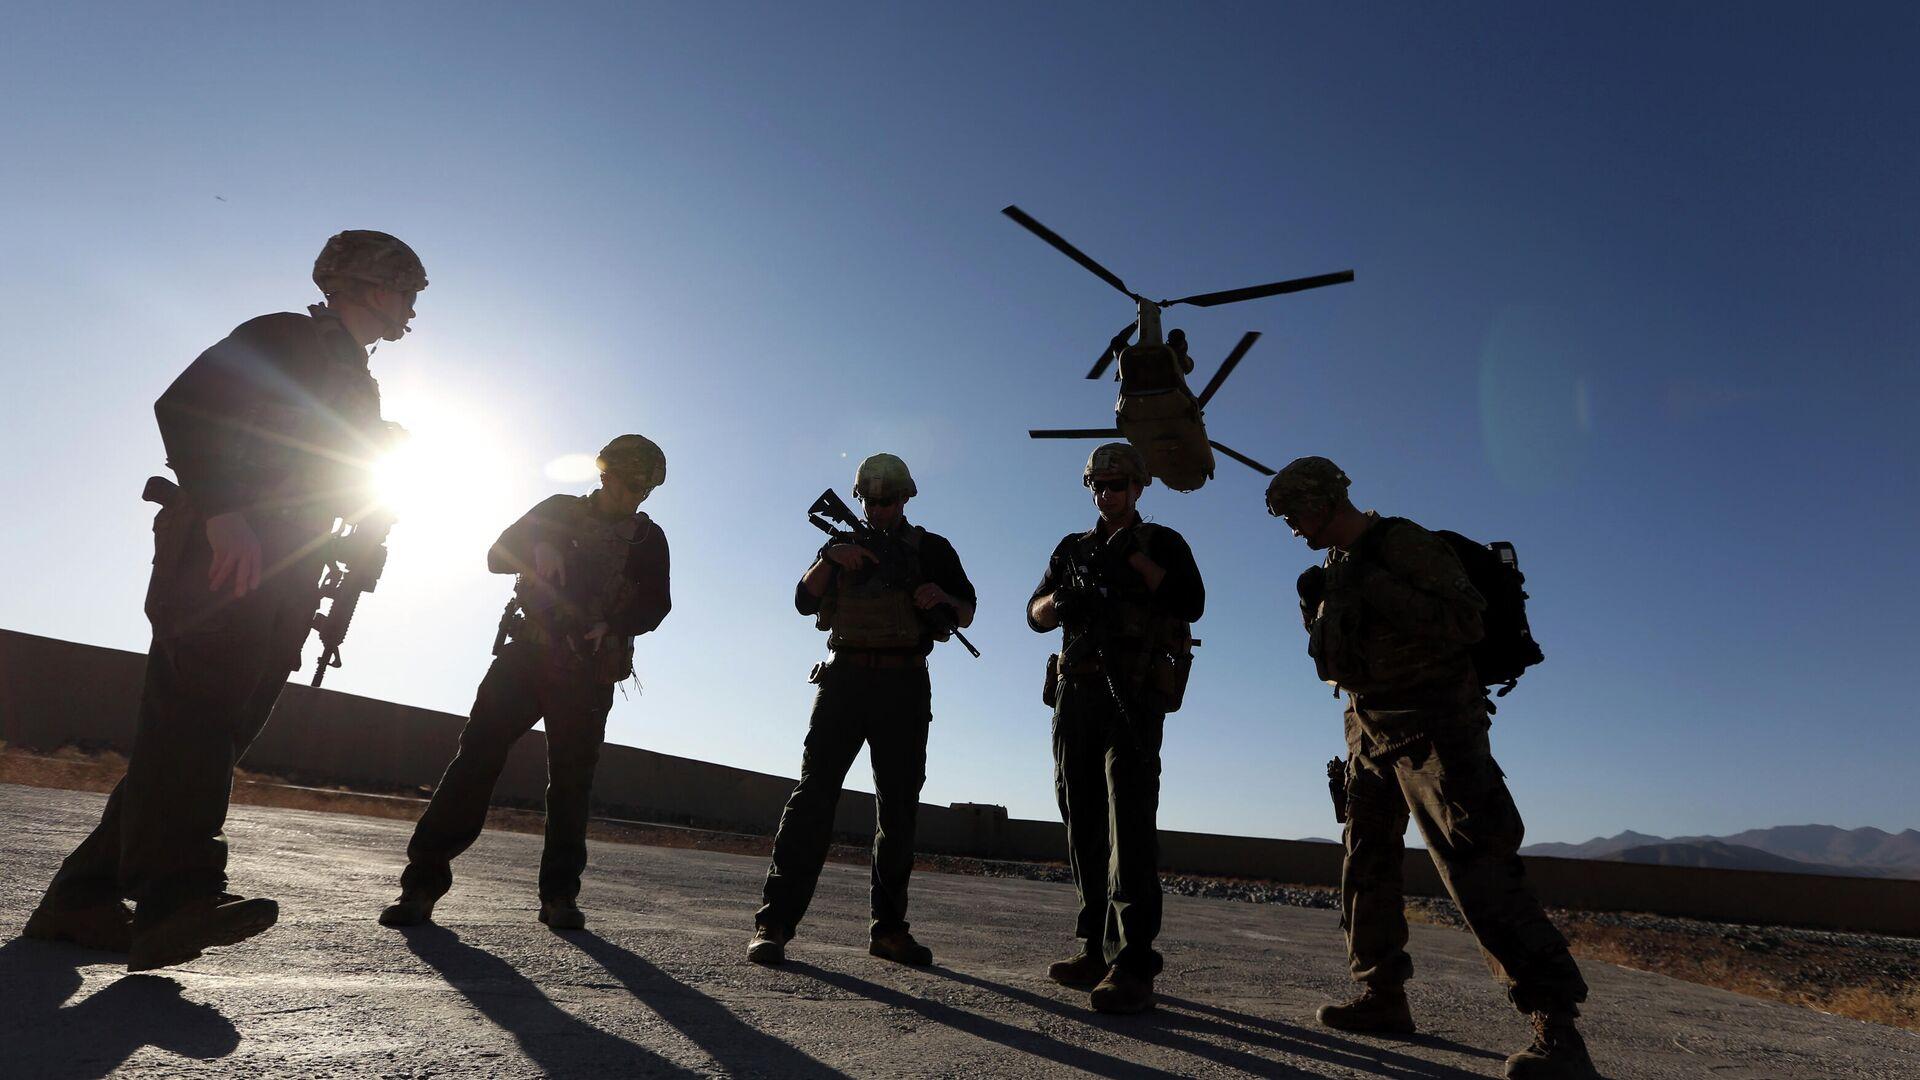 Американские солдаты в провинции Логар, Афганистан. - РИА Новости, 1920, 18.02.2021